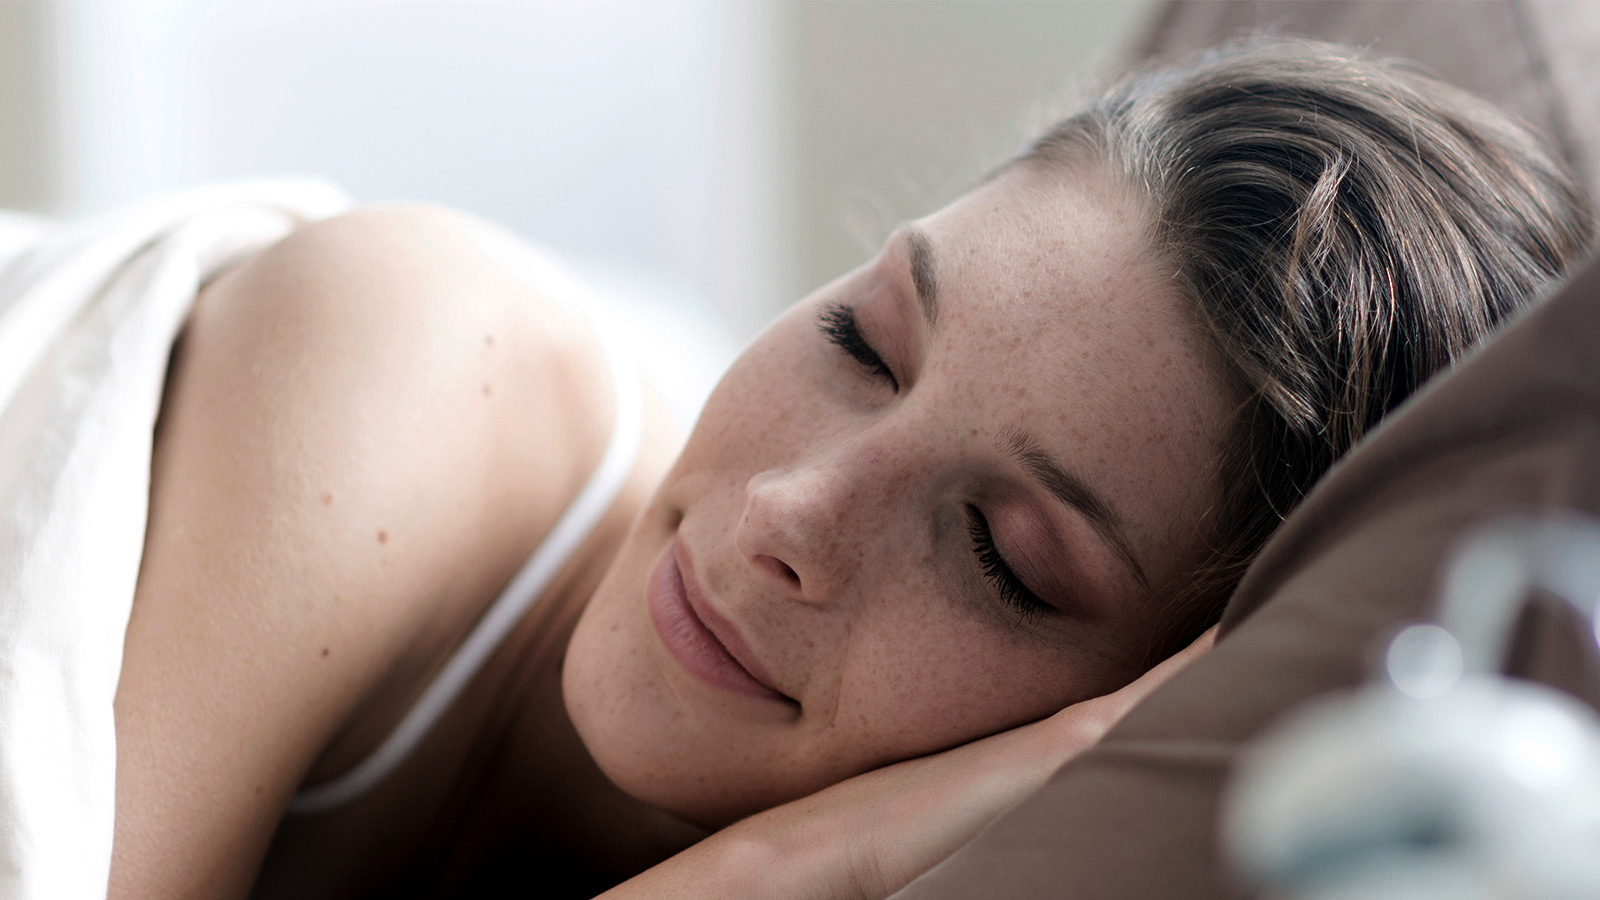 20 einfache tipps f r gesunden schlaf atupri blog. Black Bedroom Furniture Sets. Home Design Ideas